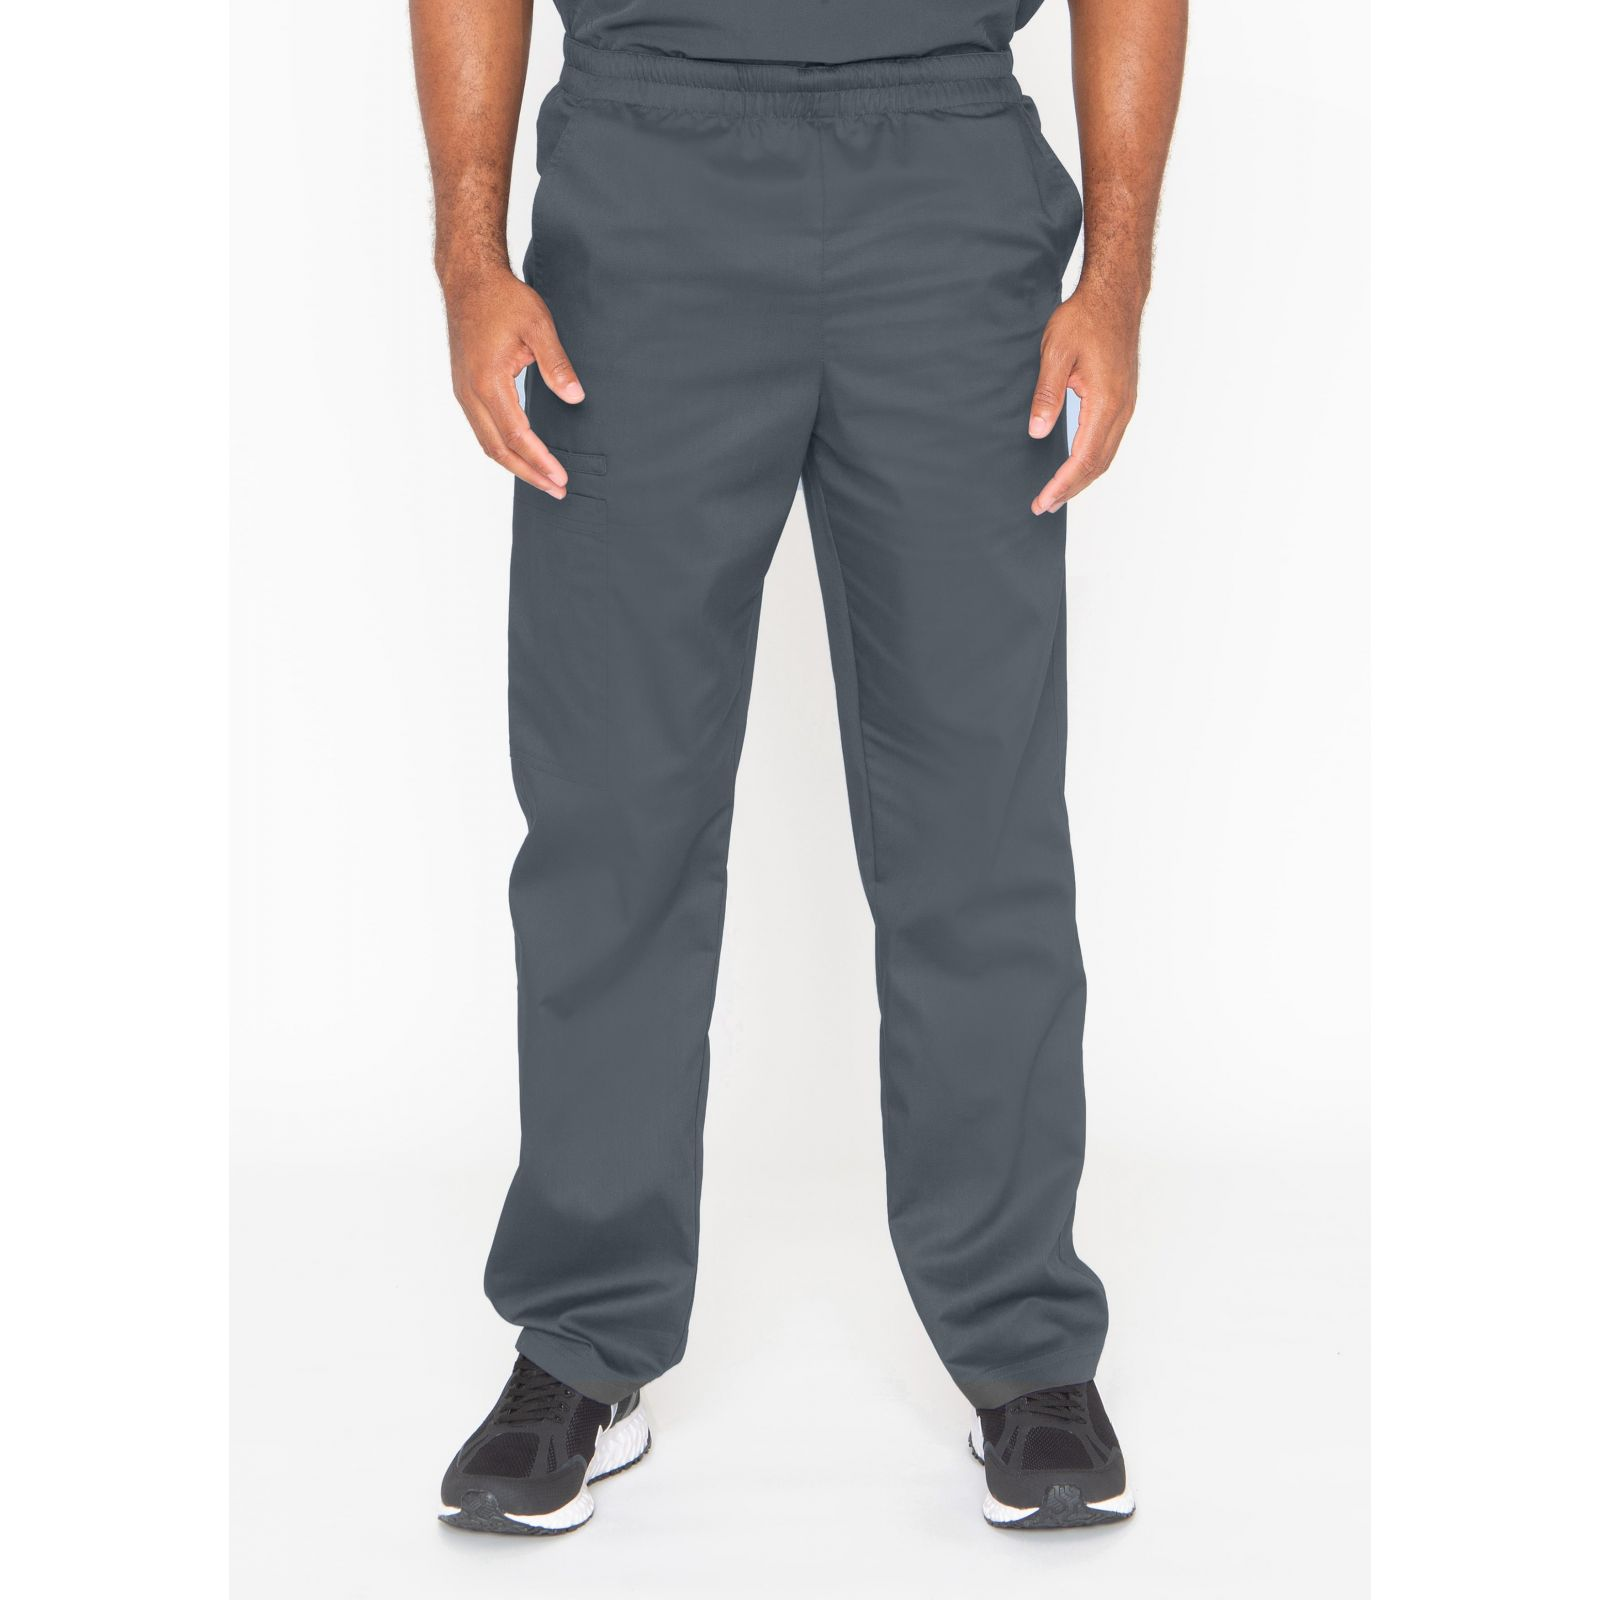 "Pantalon médical Unisexe, collection ""Barco One Essentials"" (BE005) gris"